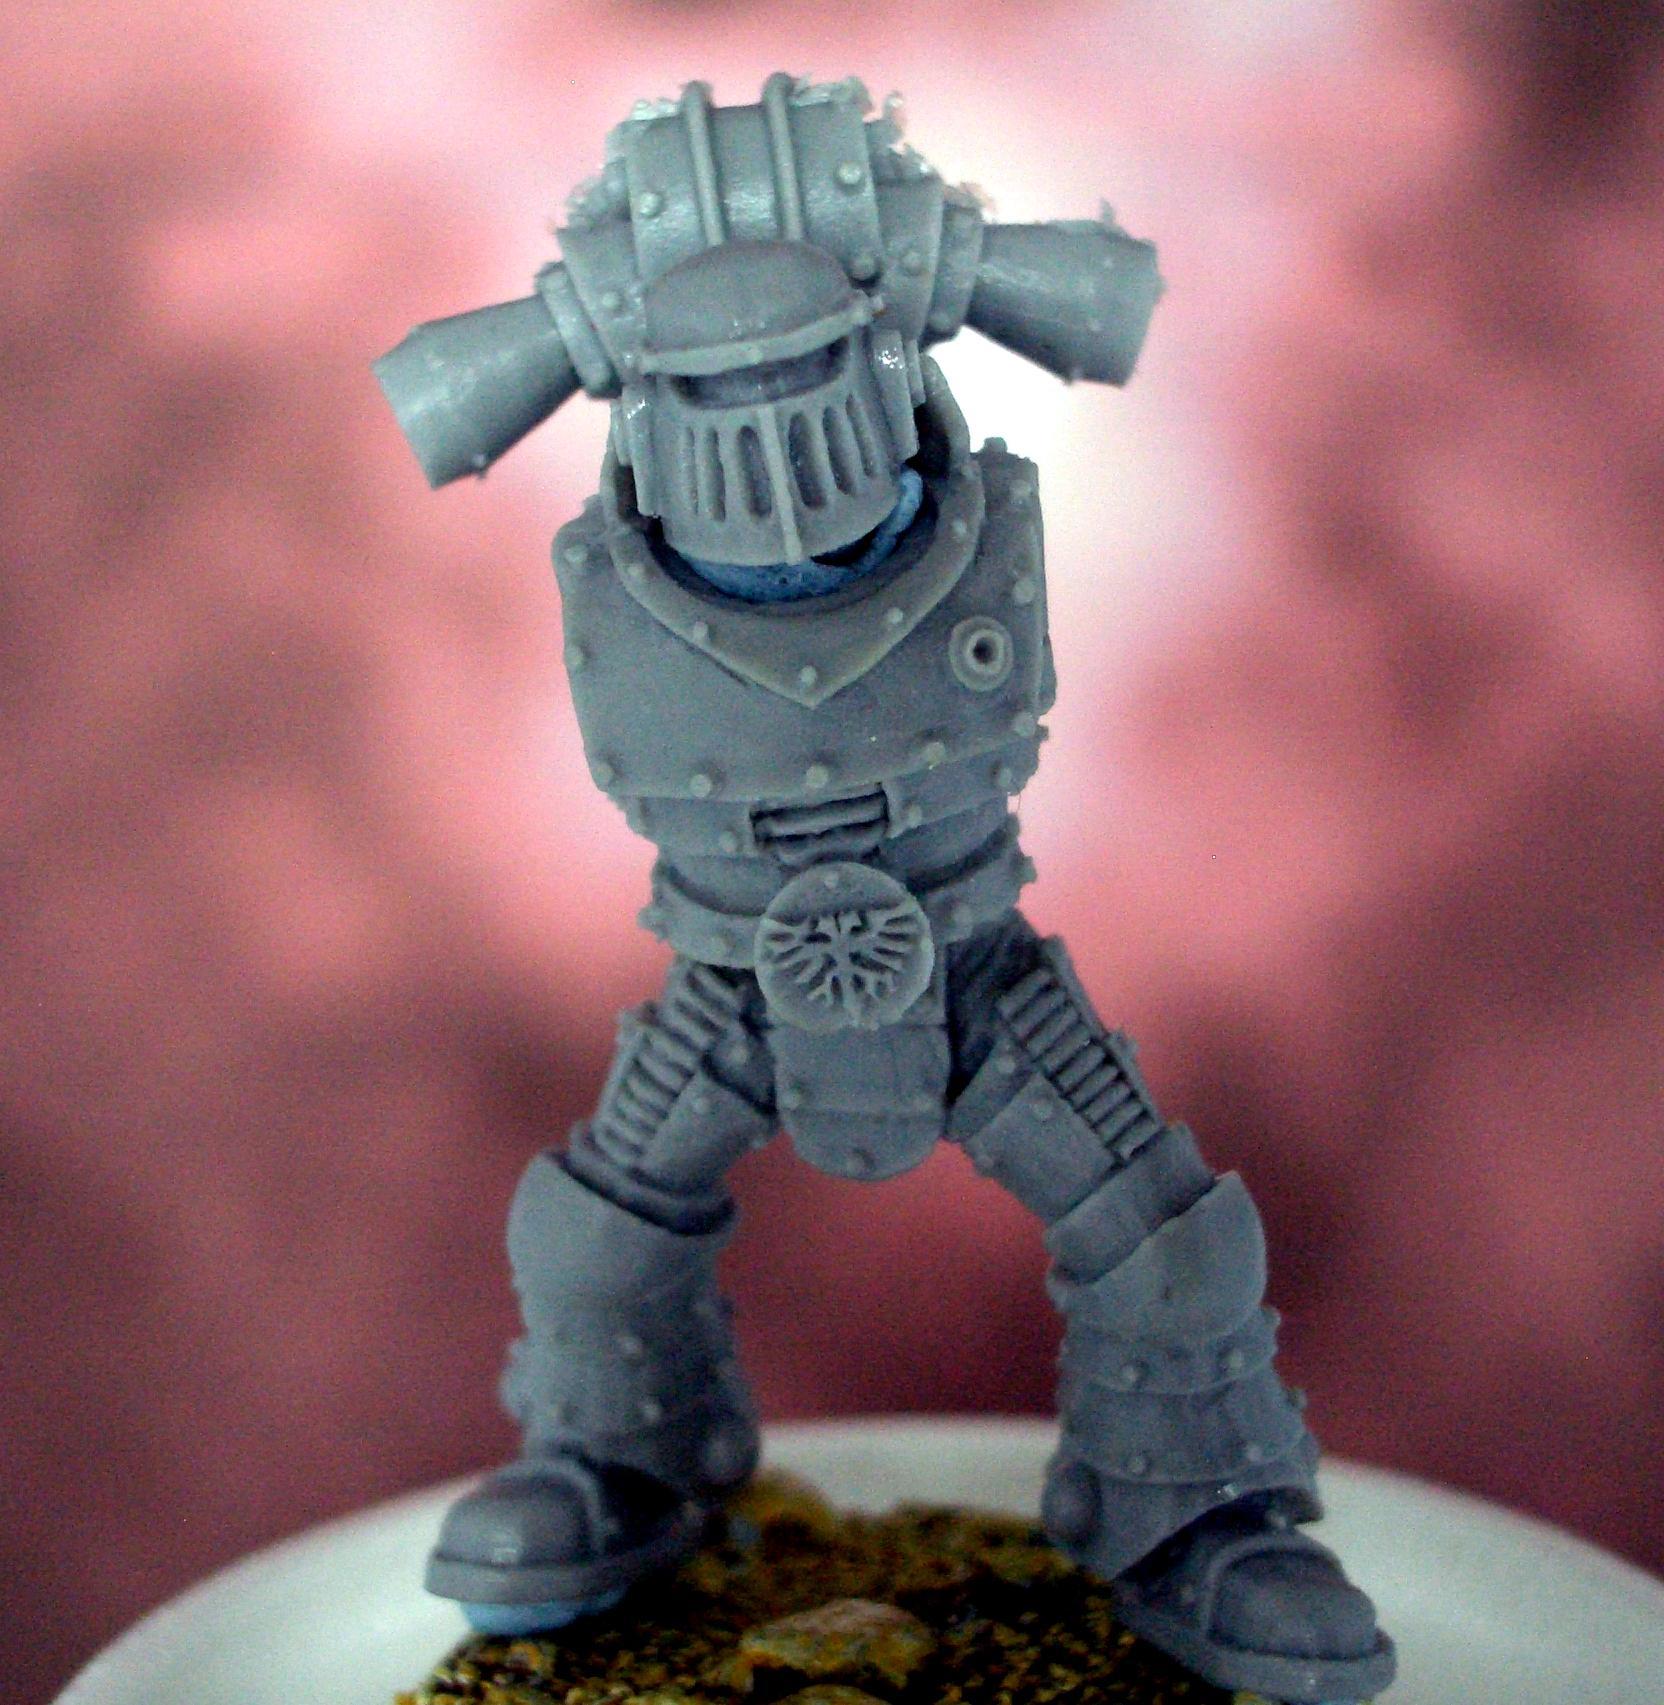 Astral, Astral Claws, Claws, Mk2 Marine, Space Marines, Warhammer 40,000, Work In Progress